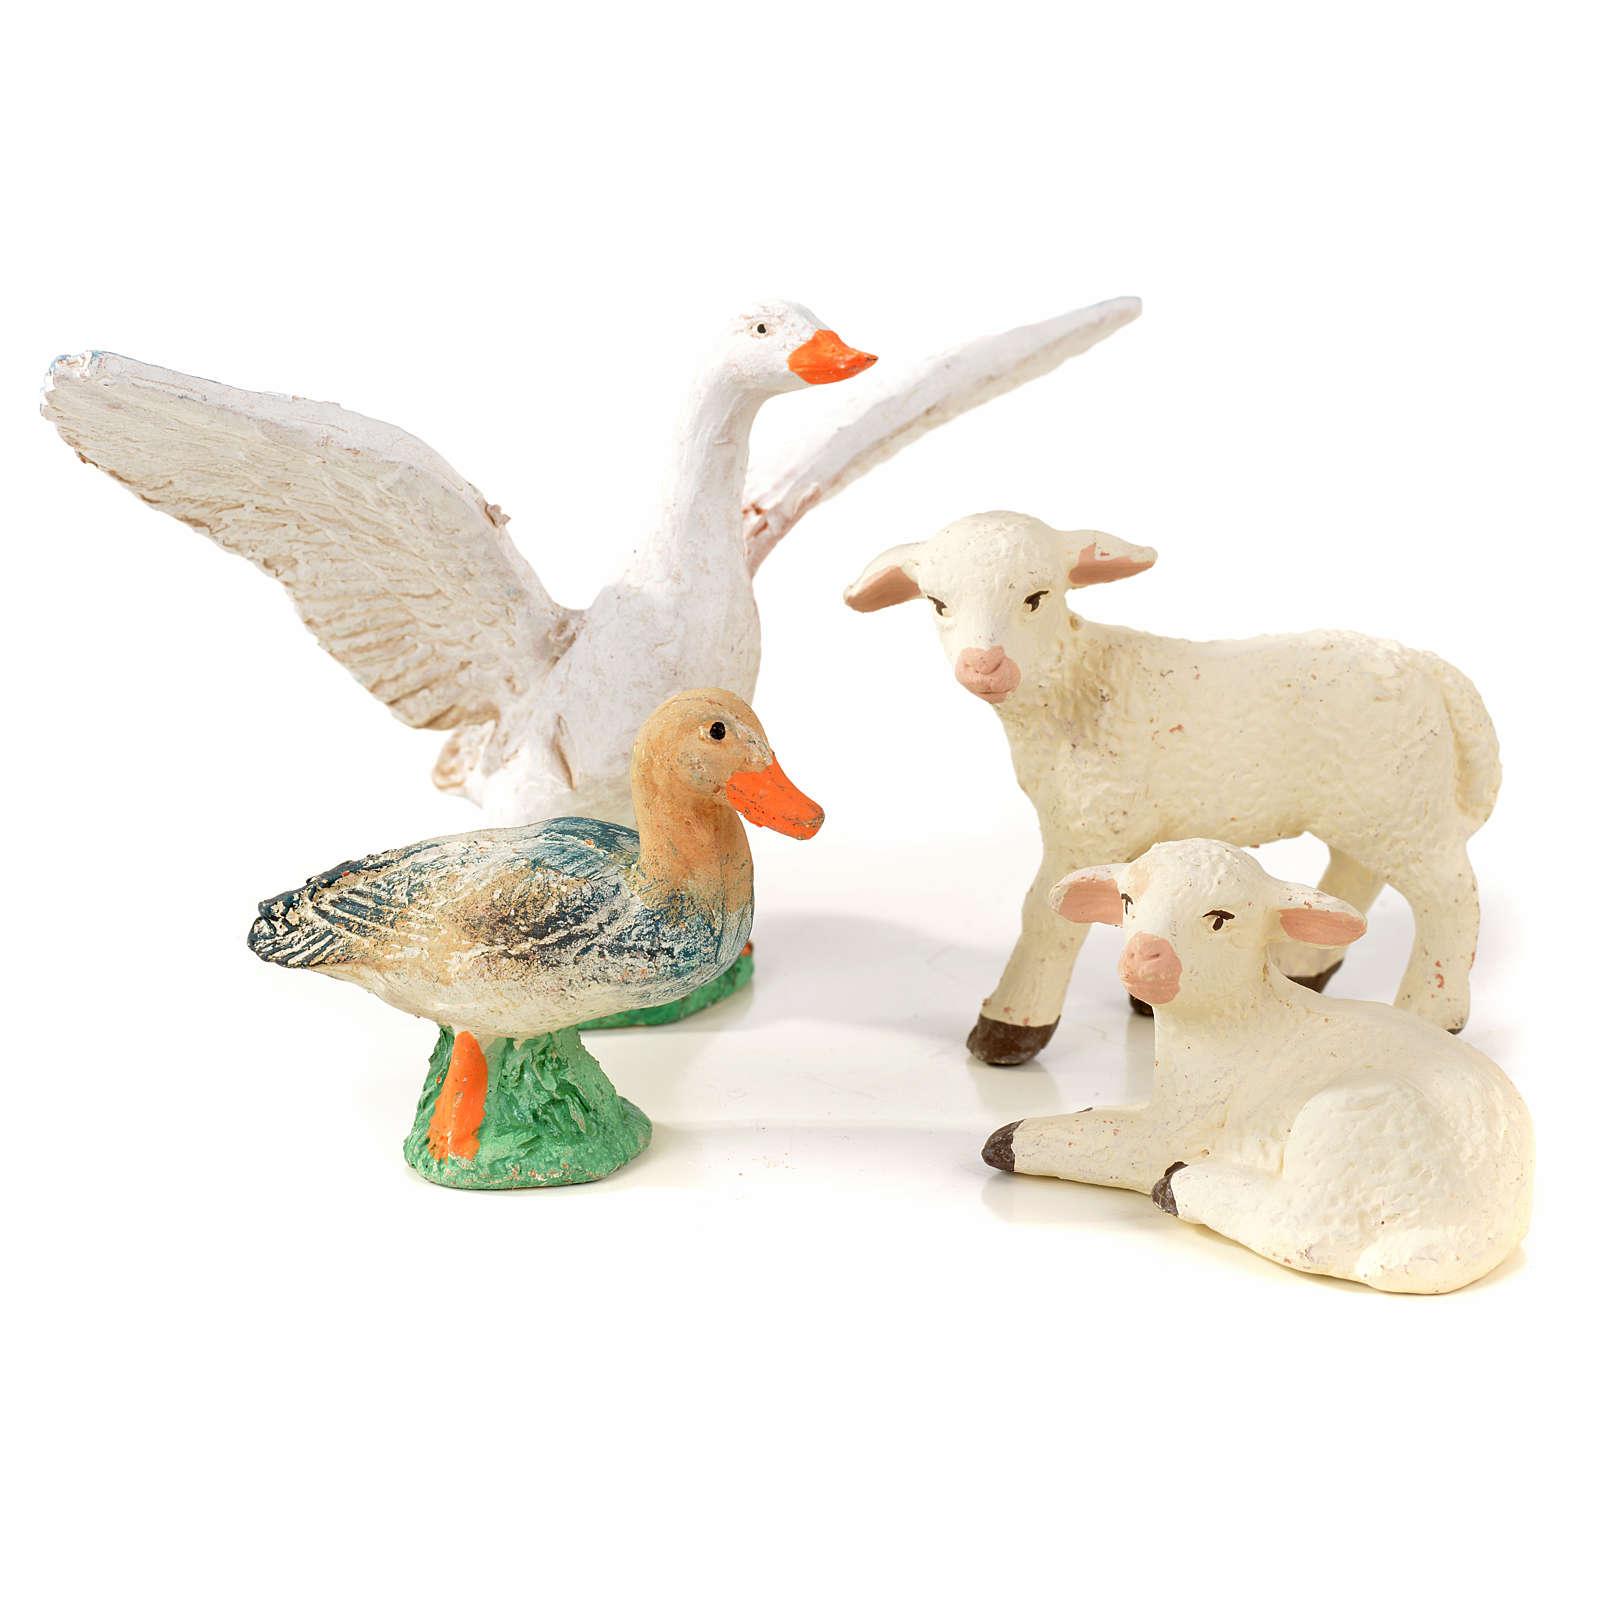 Neapolitan Nativity scene figurine, duck, goose and 2 lambs 10cm 4